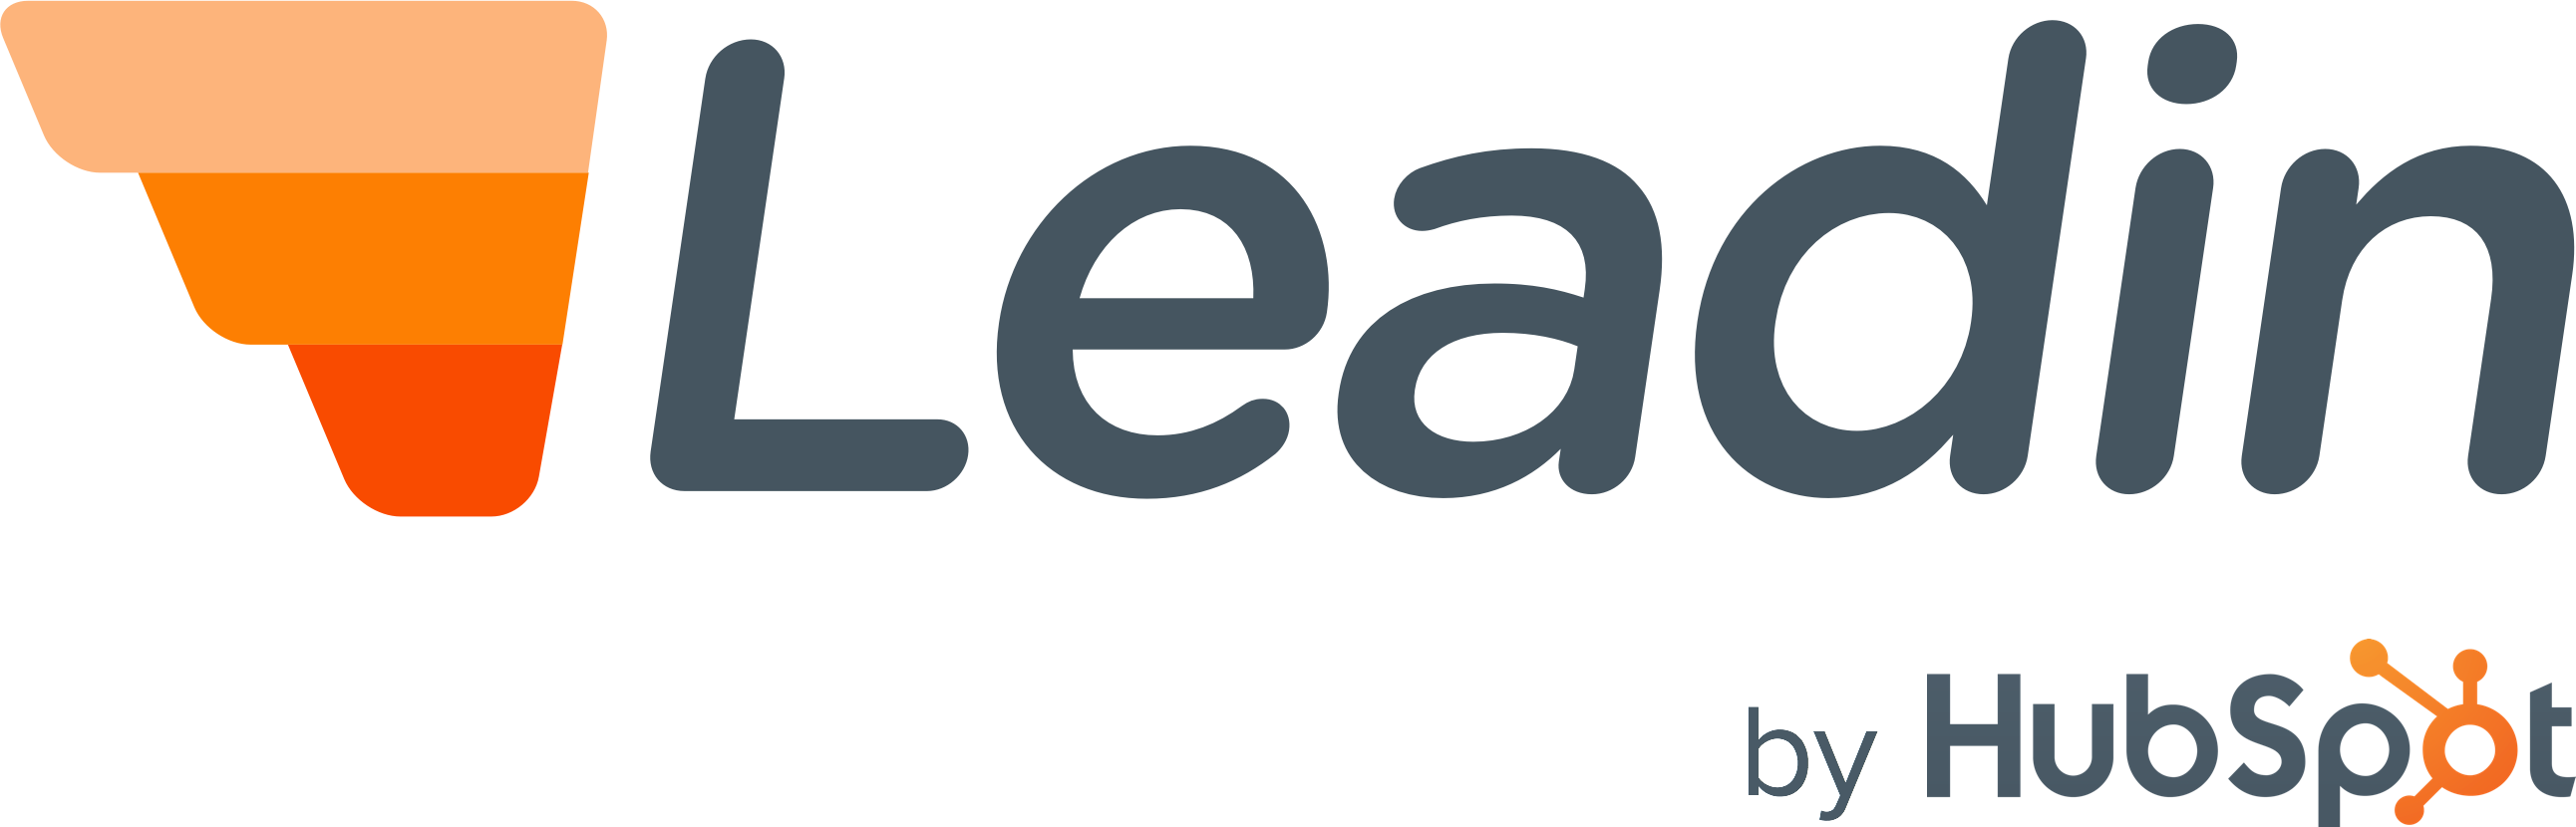 Leadin-Logo-Dark-Branding.png